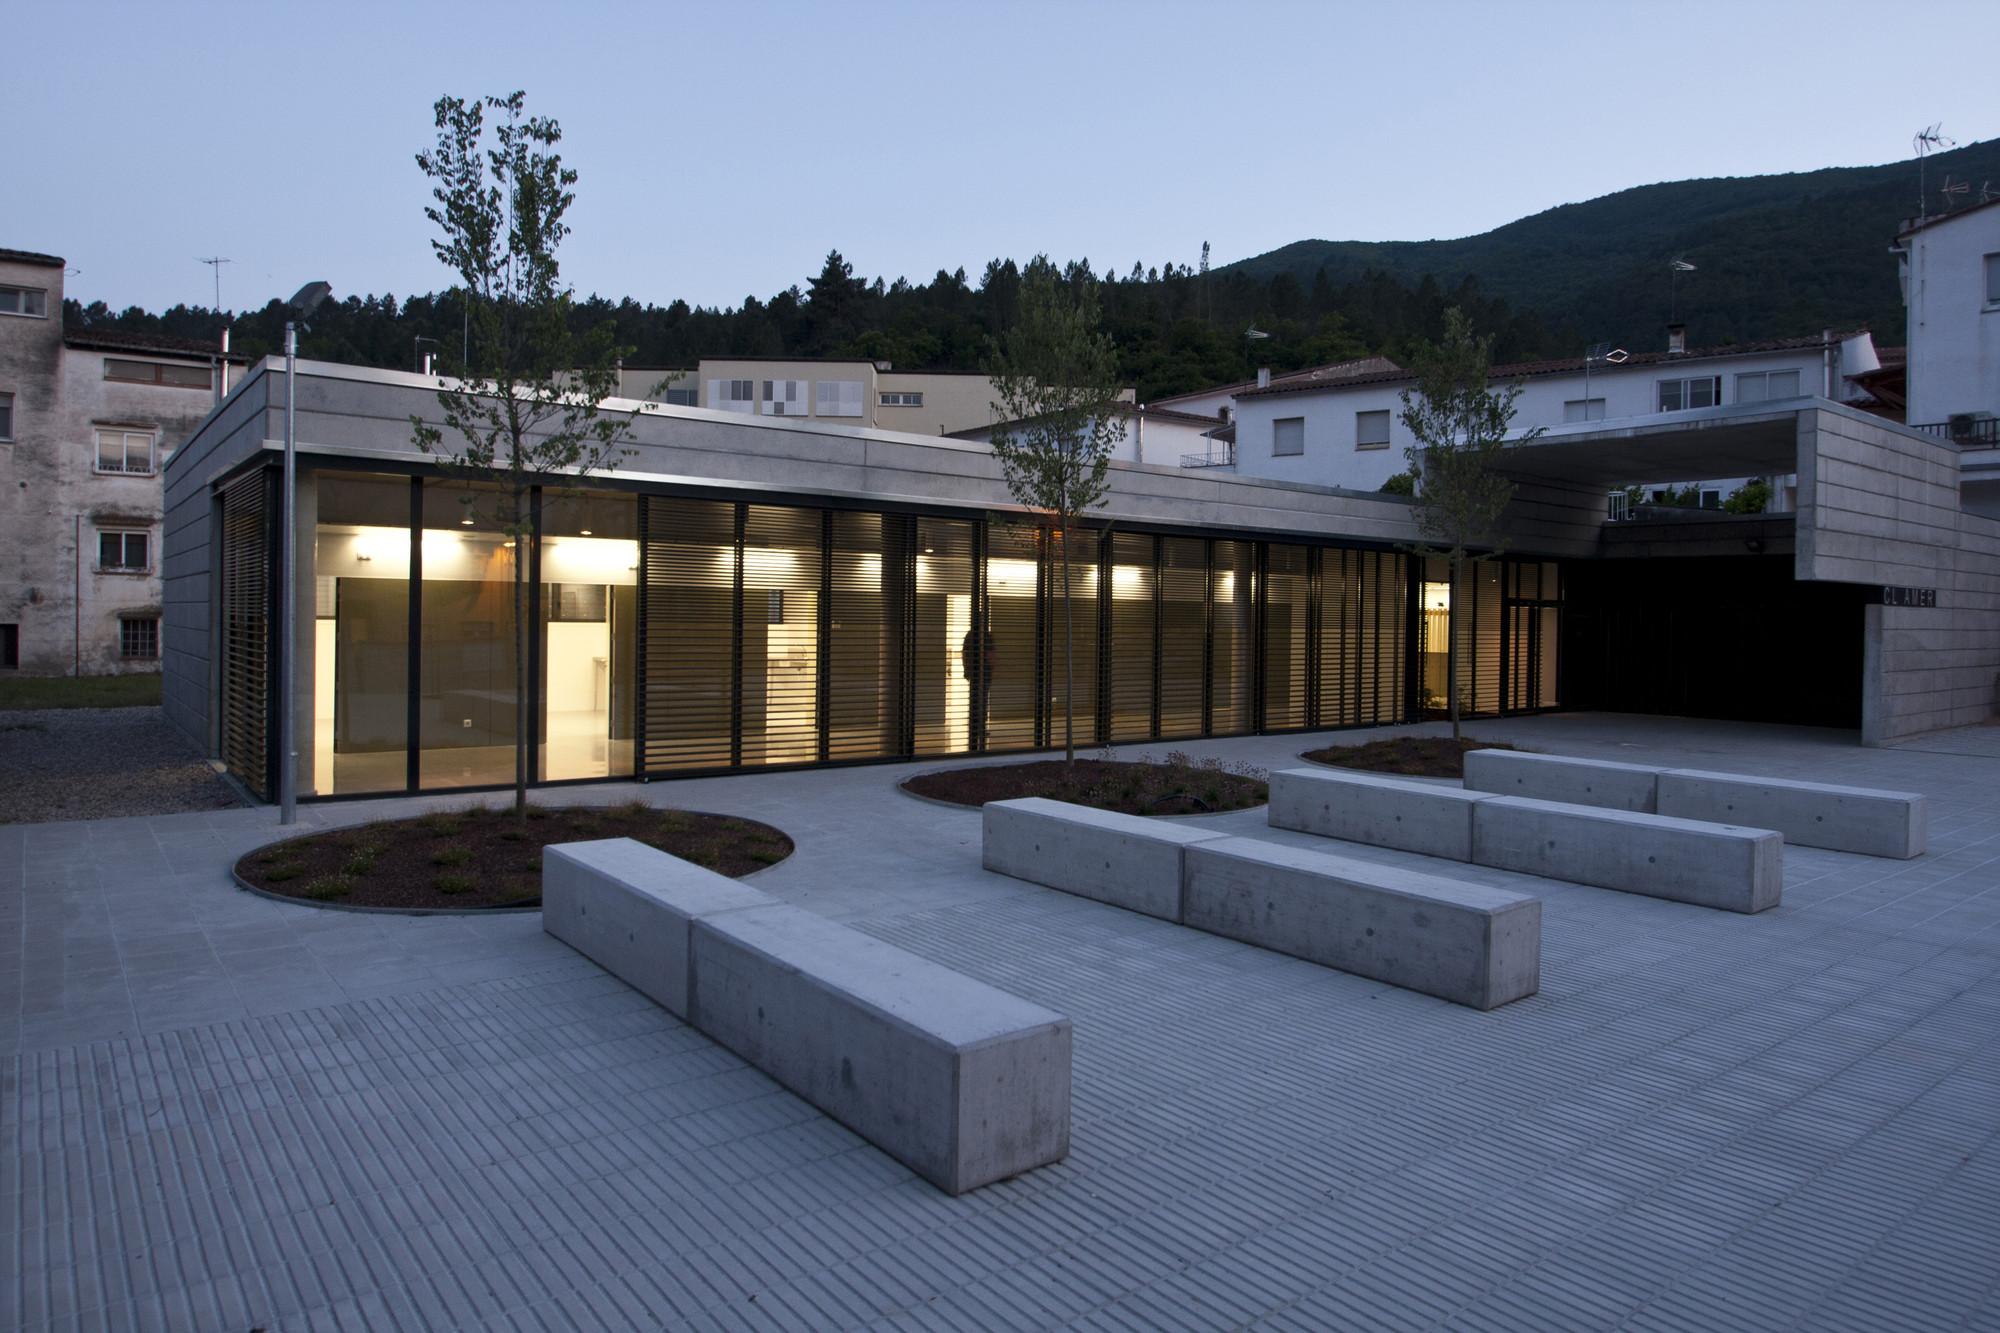 Healthcare Centre in Amer / Pm, Mt, © Alex Martínez